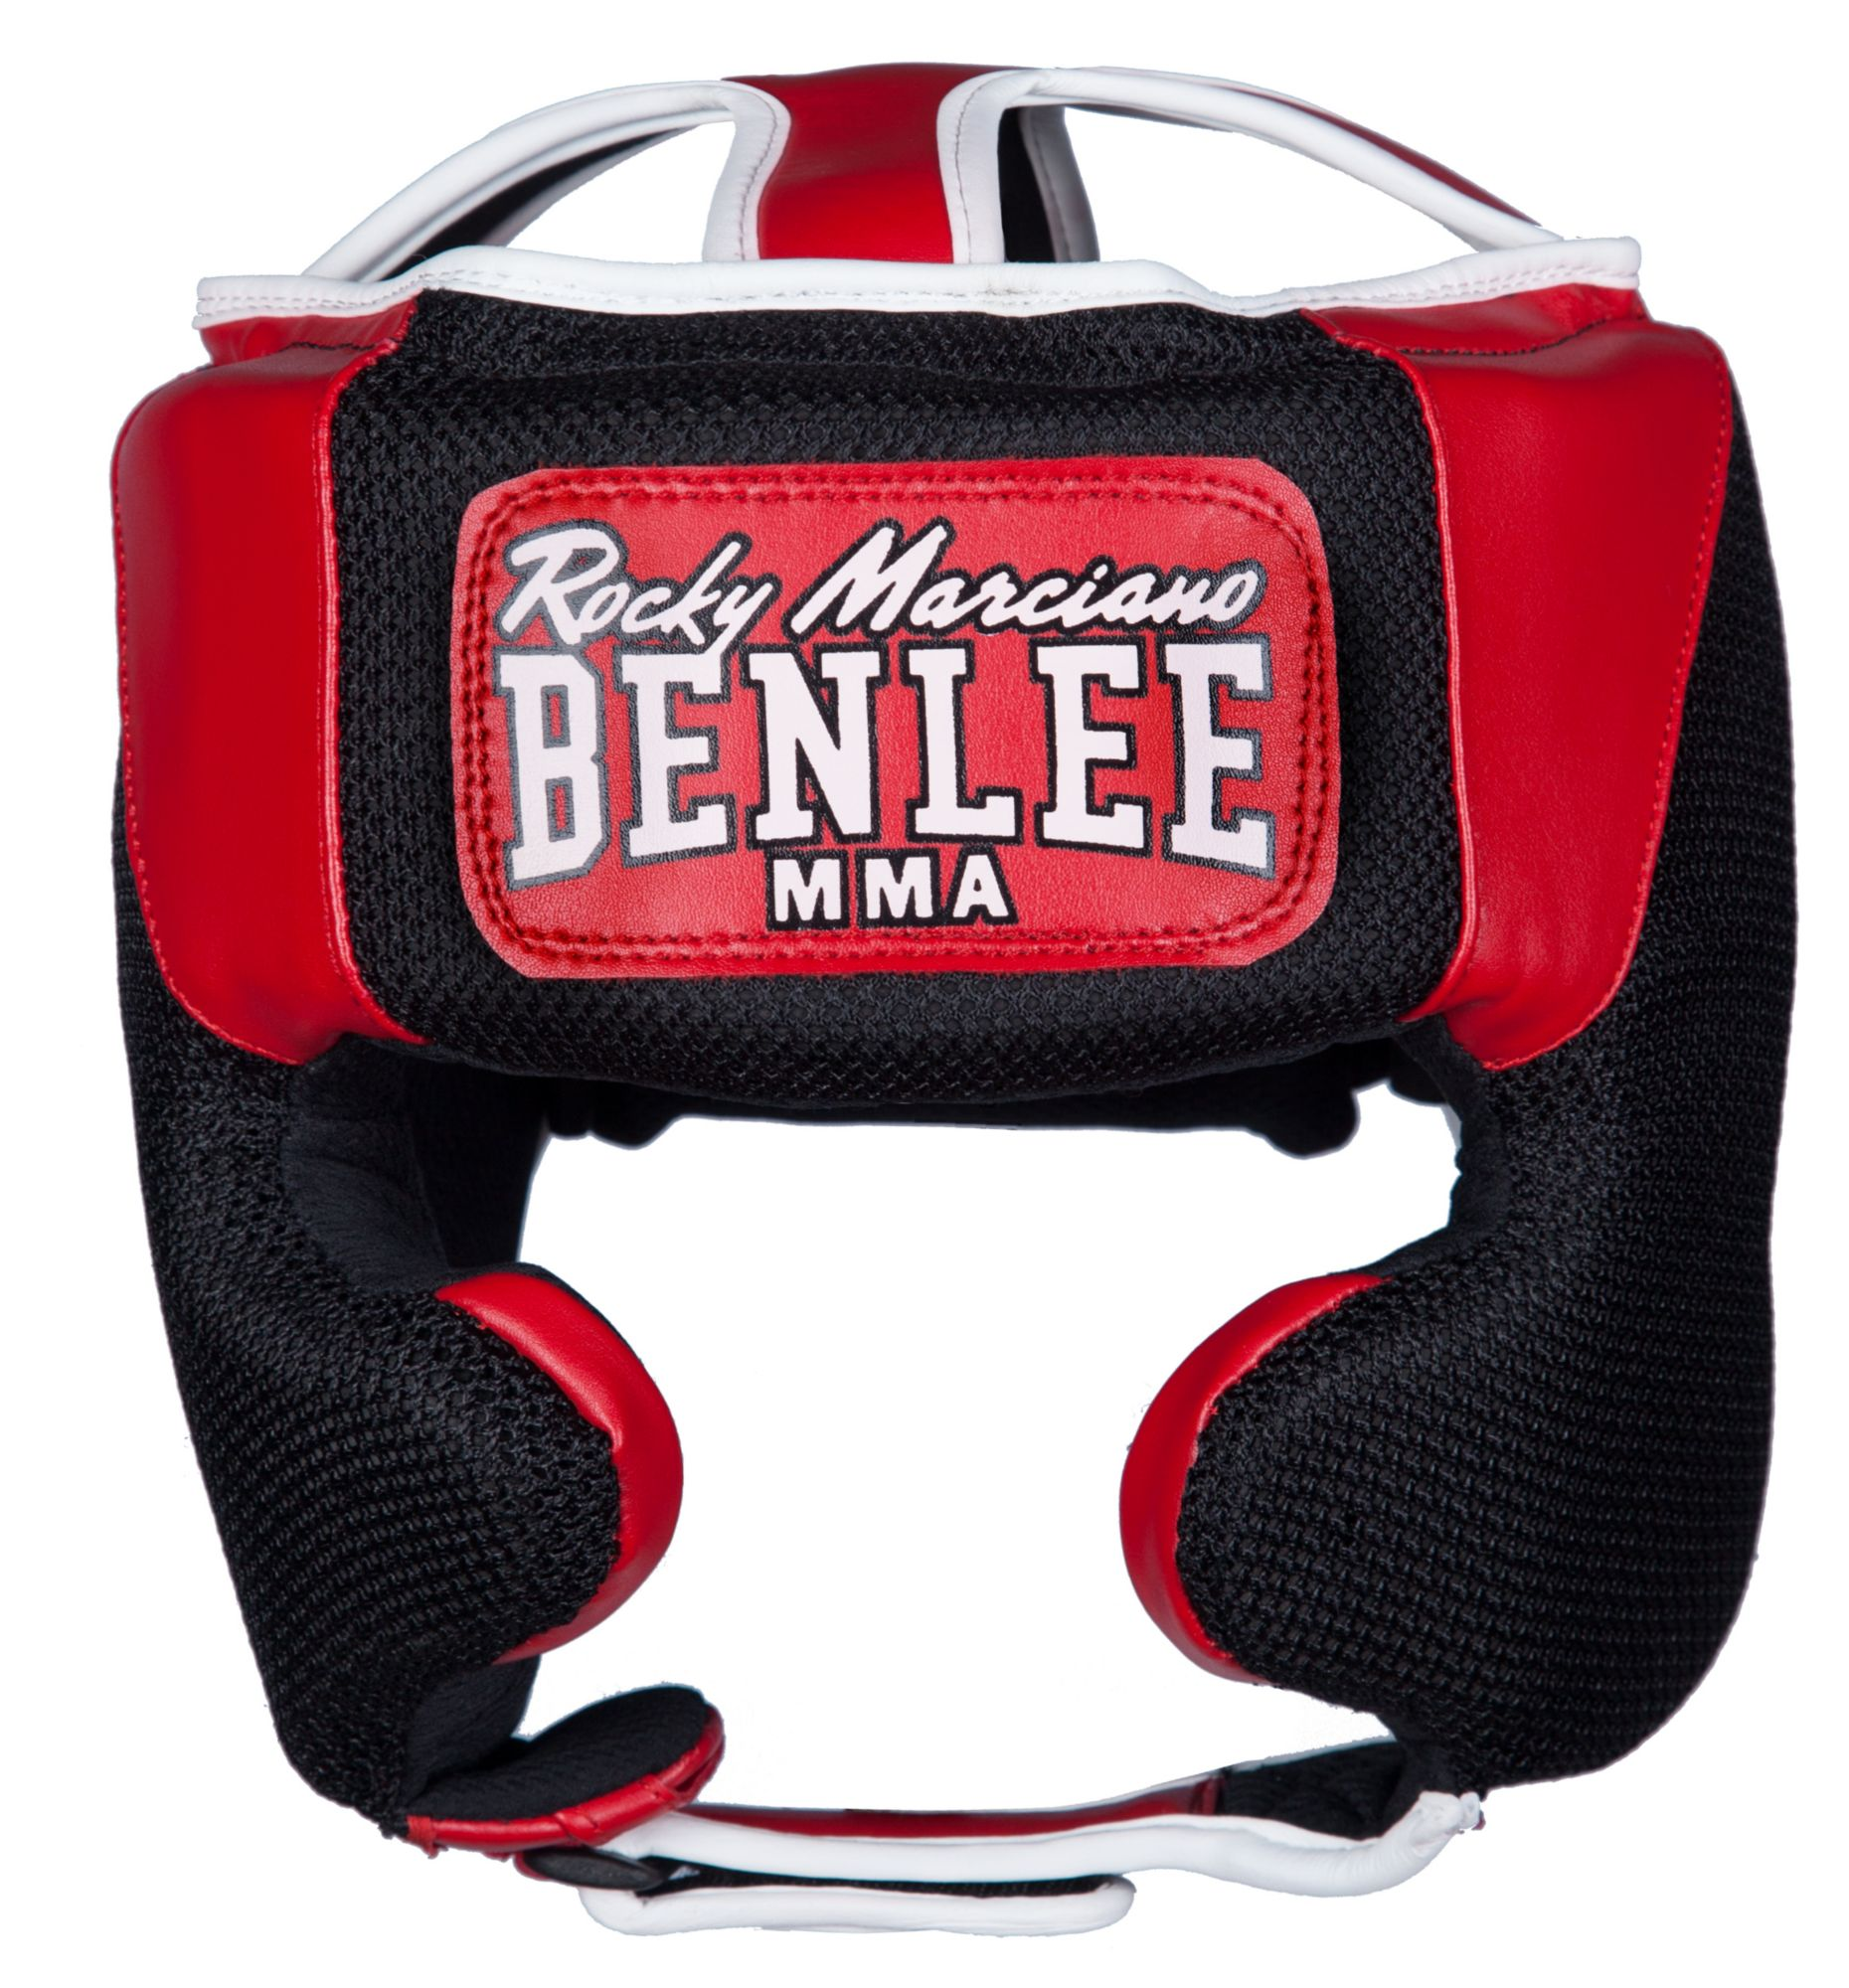 BENLEE ROCKY MARCIANO Benlee Rocky Marciano Kopfschutz »PU MMA«